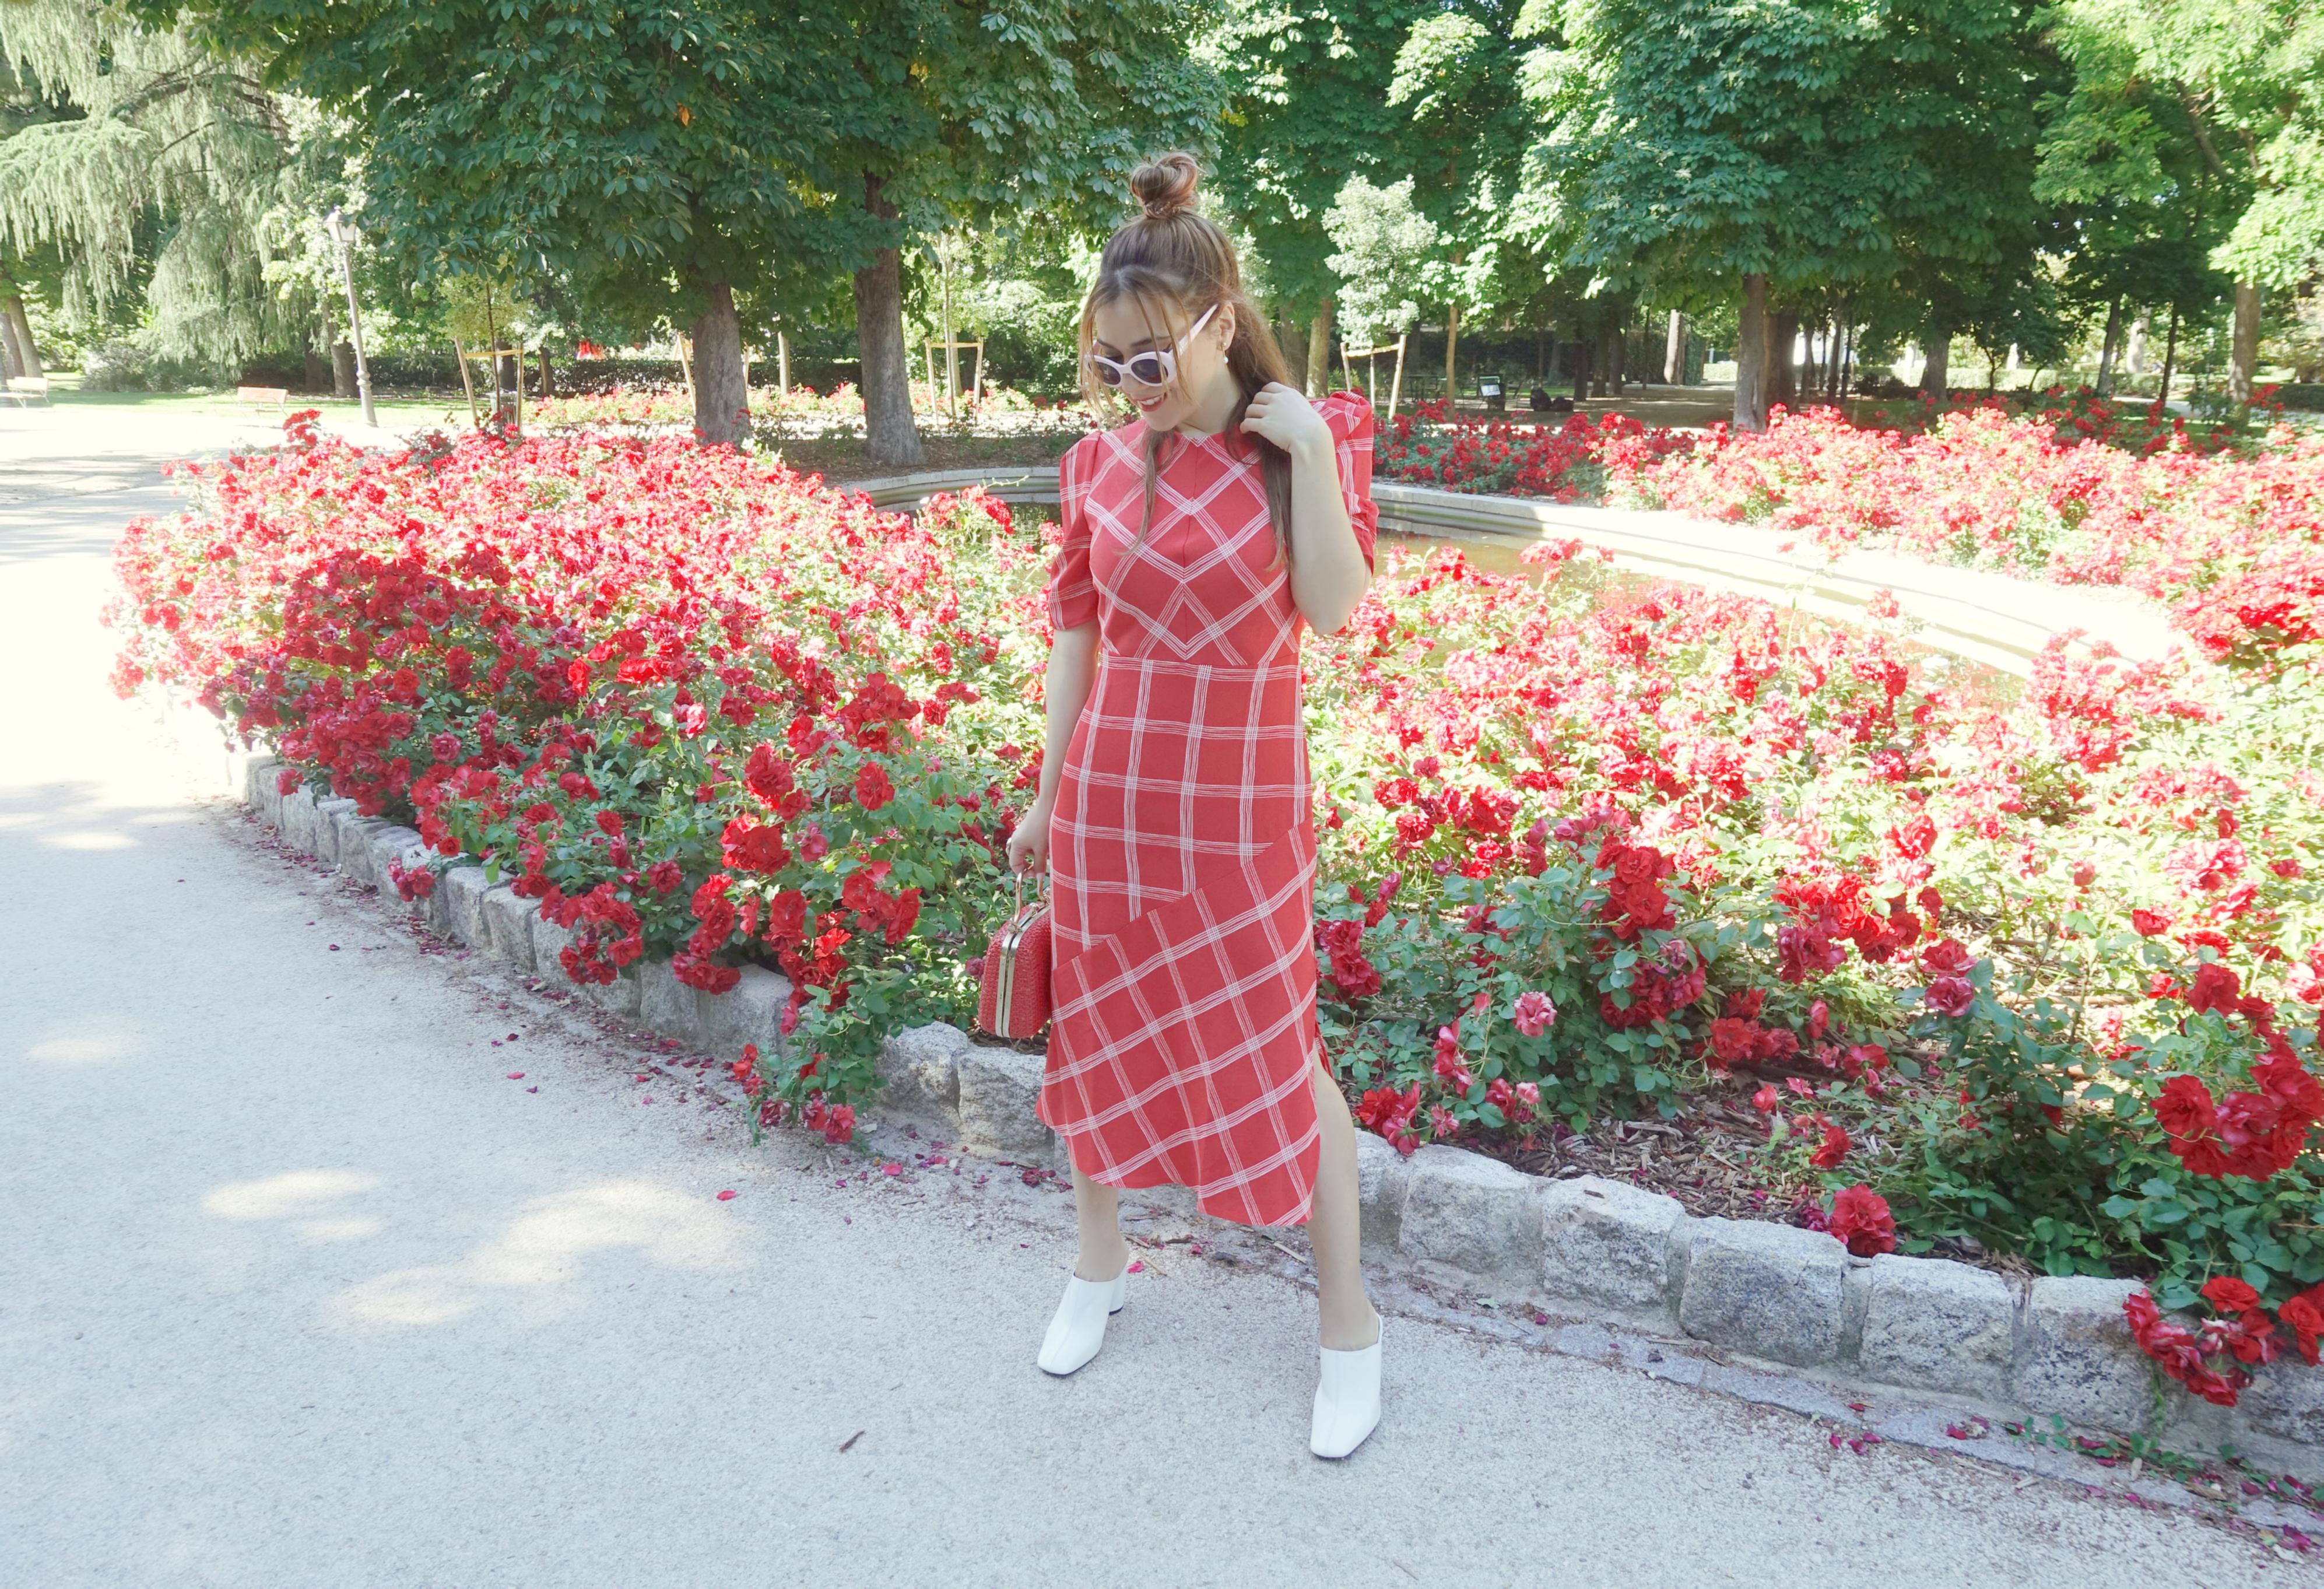 ChicAdicta-blog-de-moda-fashionista-Chic-Adicta-influencer-spain-vestidos-AmazonModa-PiensaenChic-Find-Piensa-en-Chic